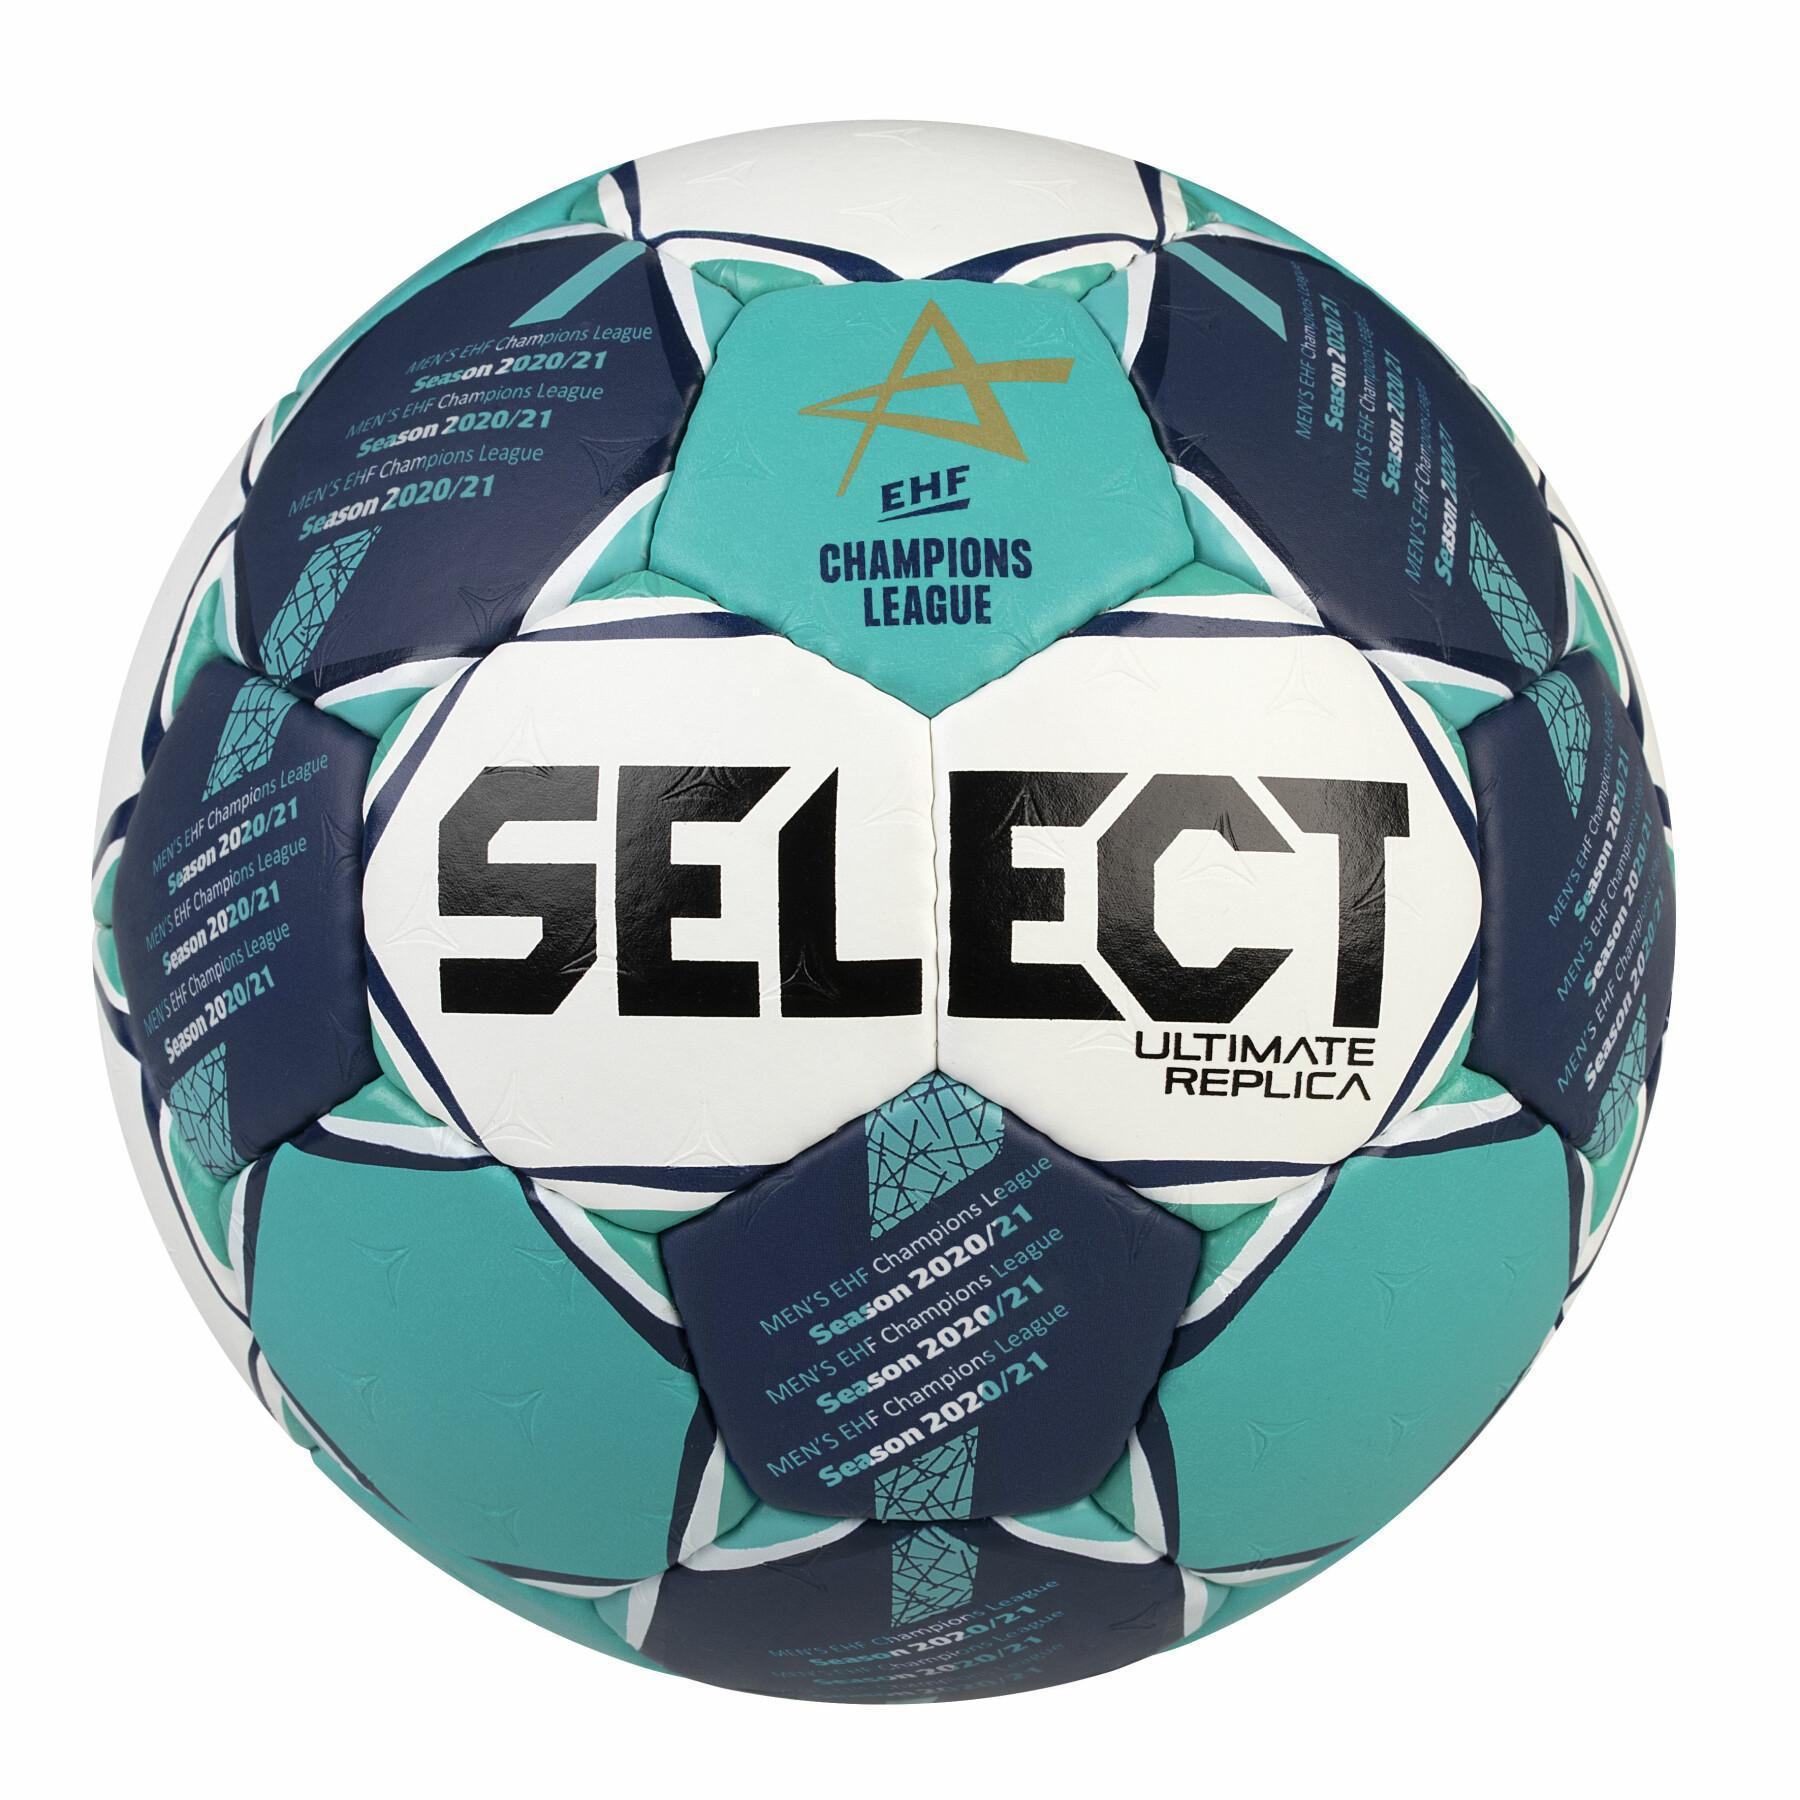 Replica Ball Ultimate Champions League Women 2020/21